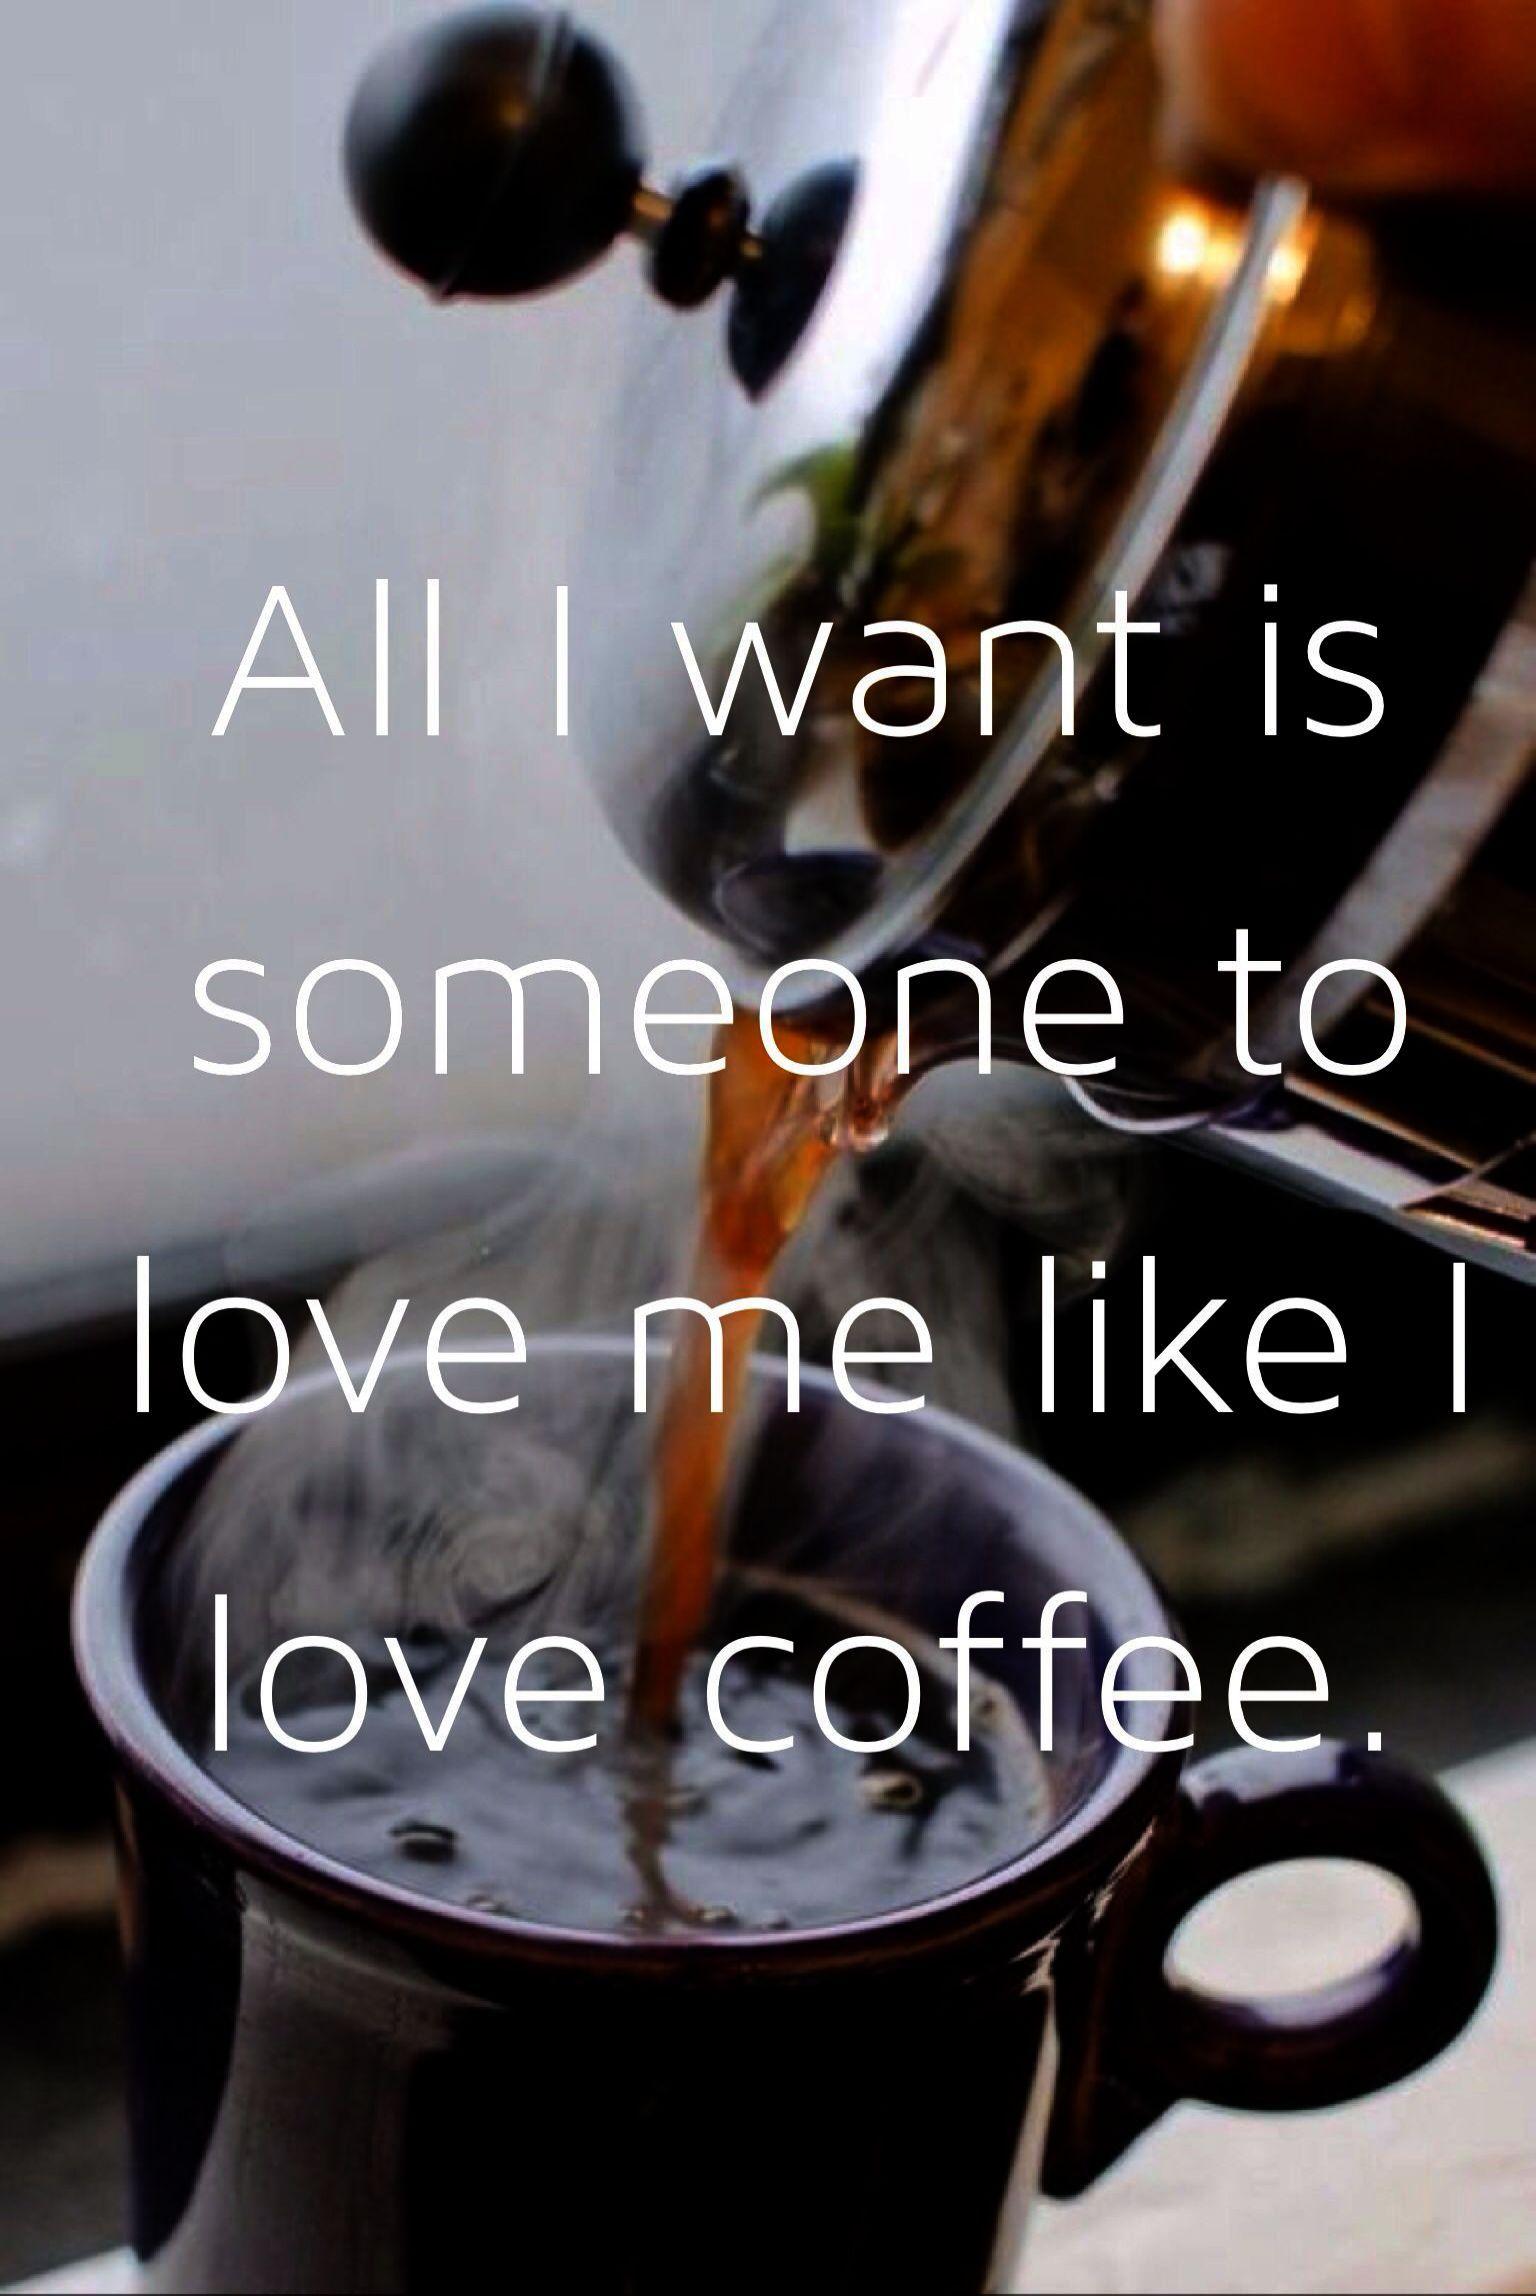 Coffee Biscuits Thermomix Like Coffee Island Near Me Before Coffee Shops Near Me San Francisco Coffee Love Coffee Tasting Coffee Island